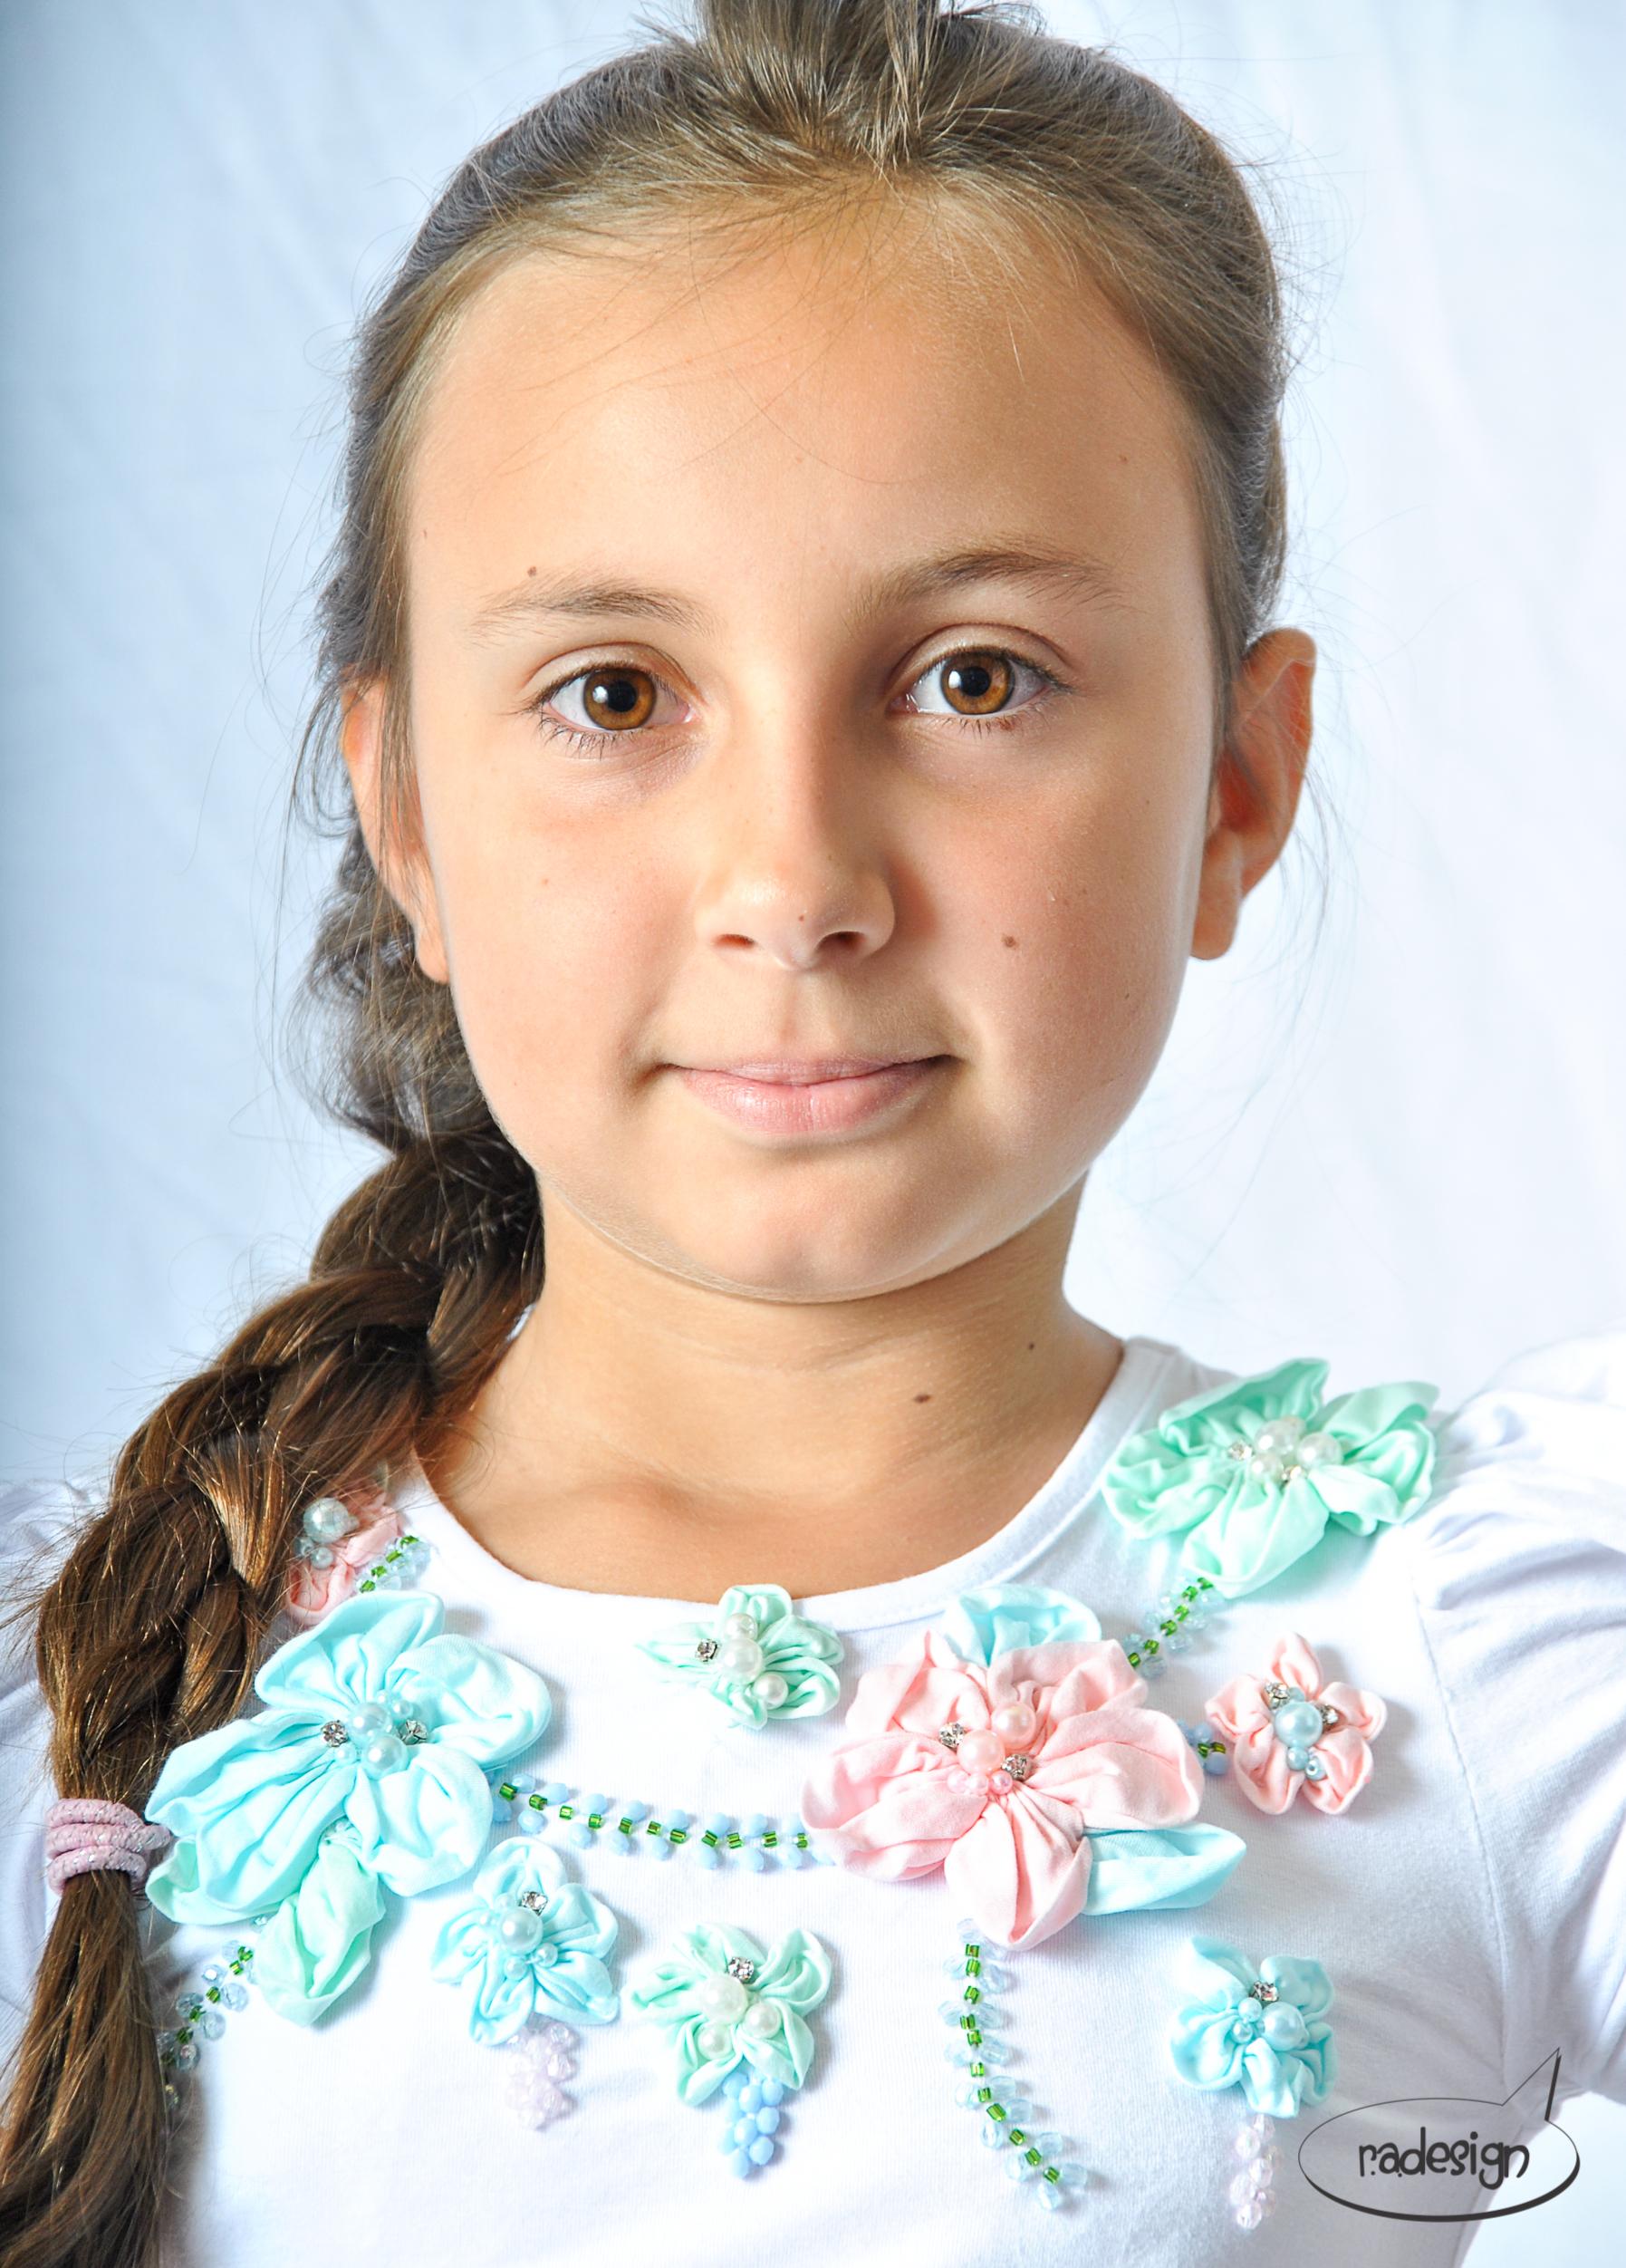 10 Anos Ana Luisa 017.jpg